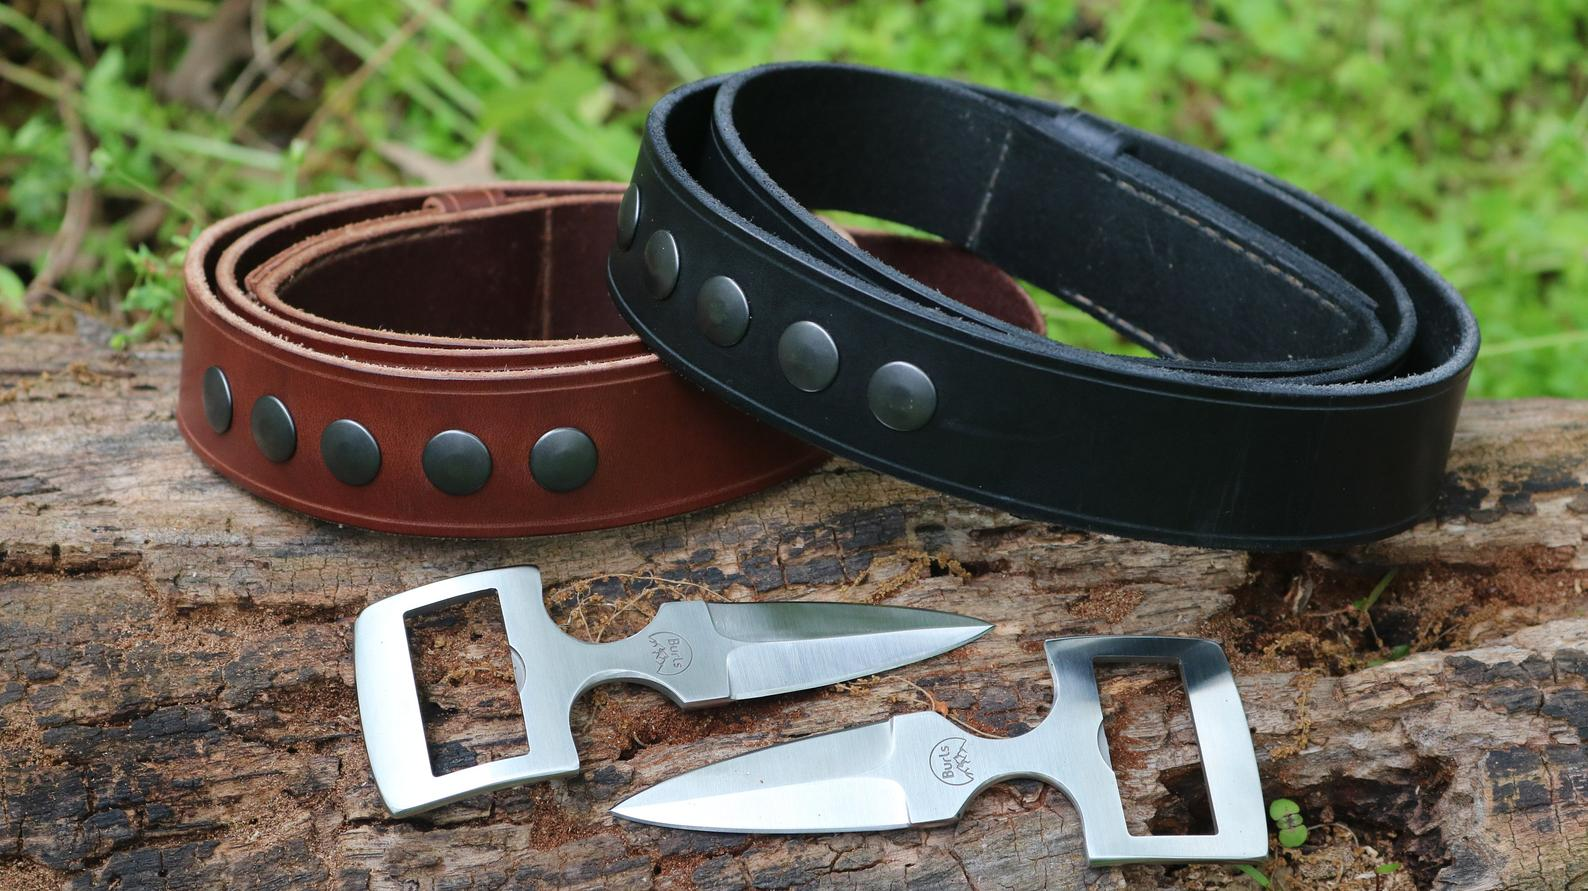 Belt Buckle Knife and Bottle Opener for Men by Gifter World